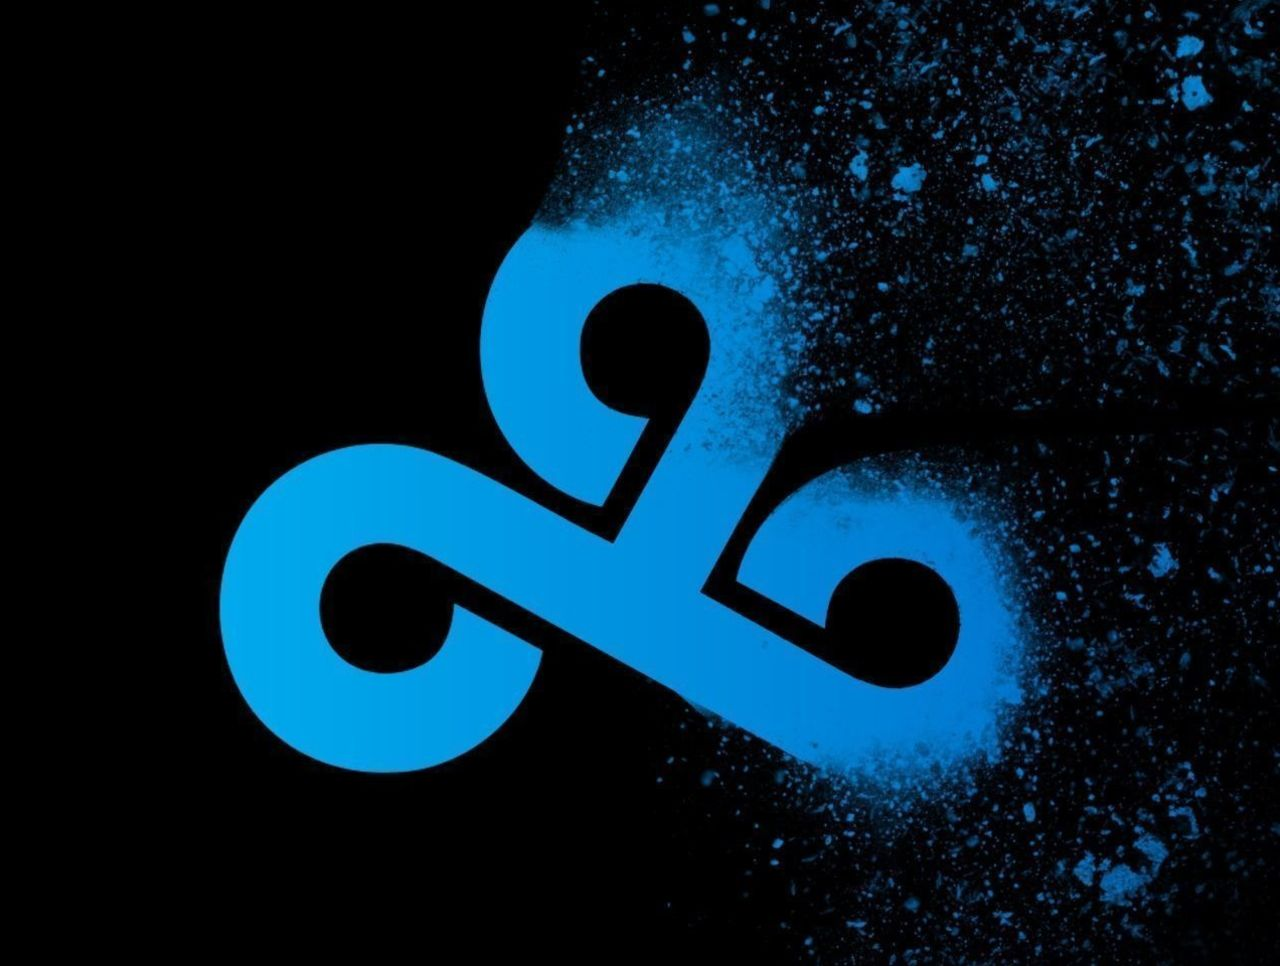 Cropped cloud9 logo